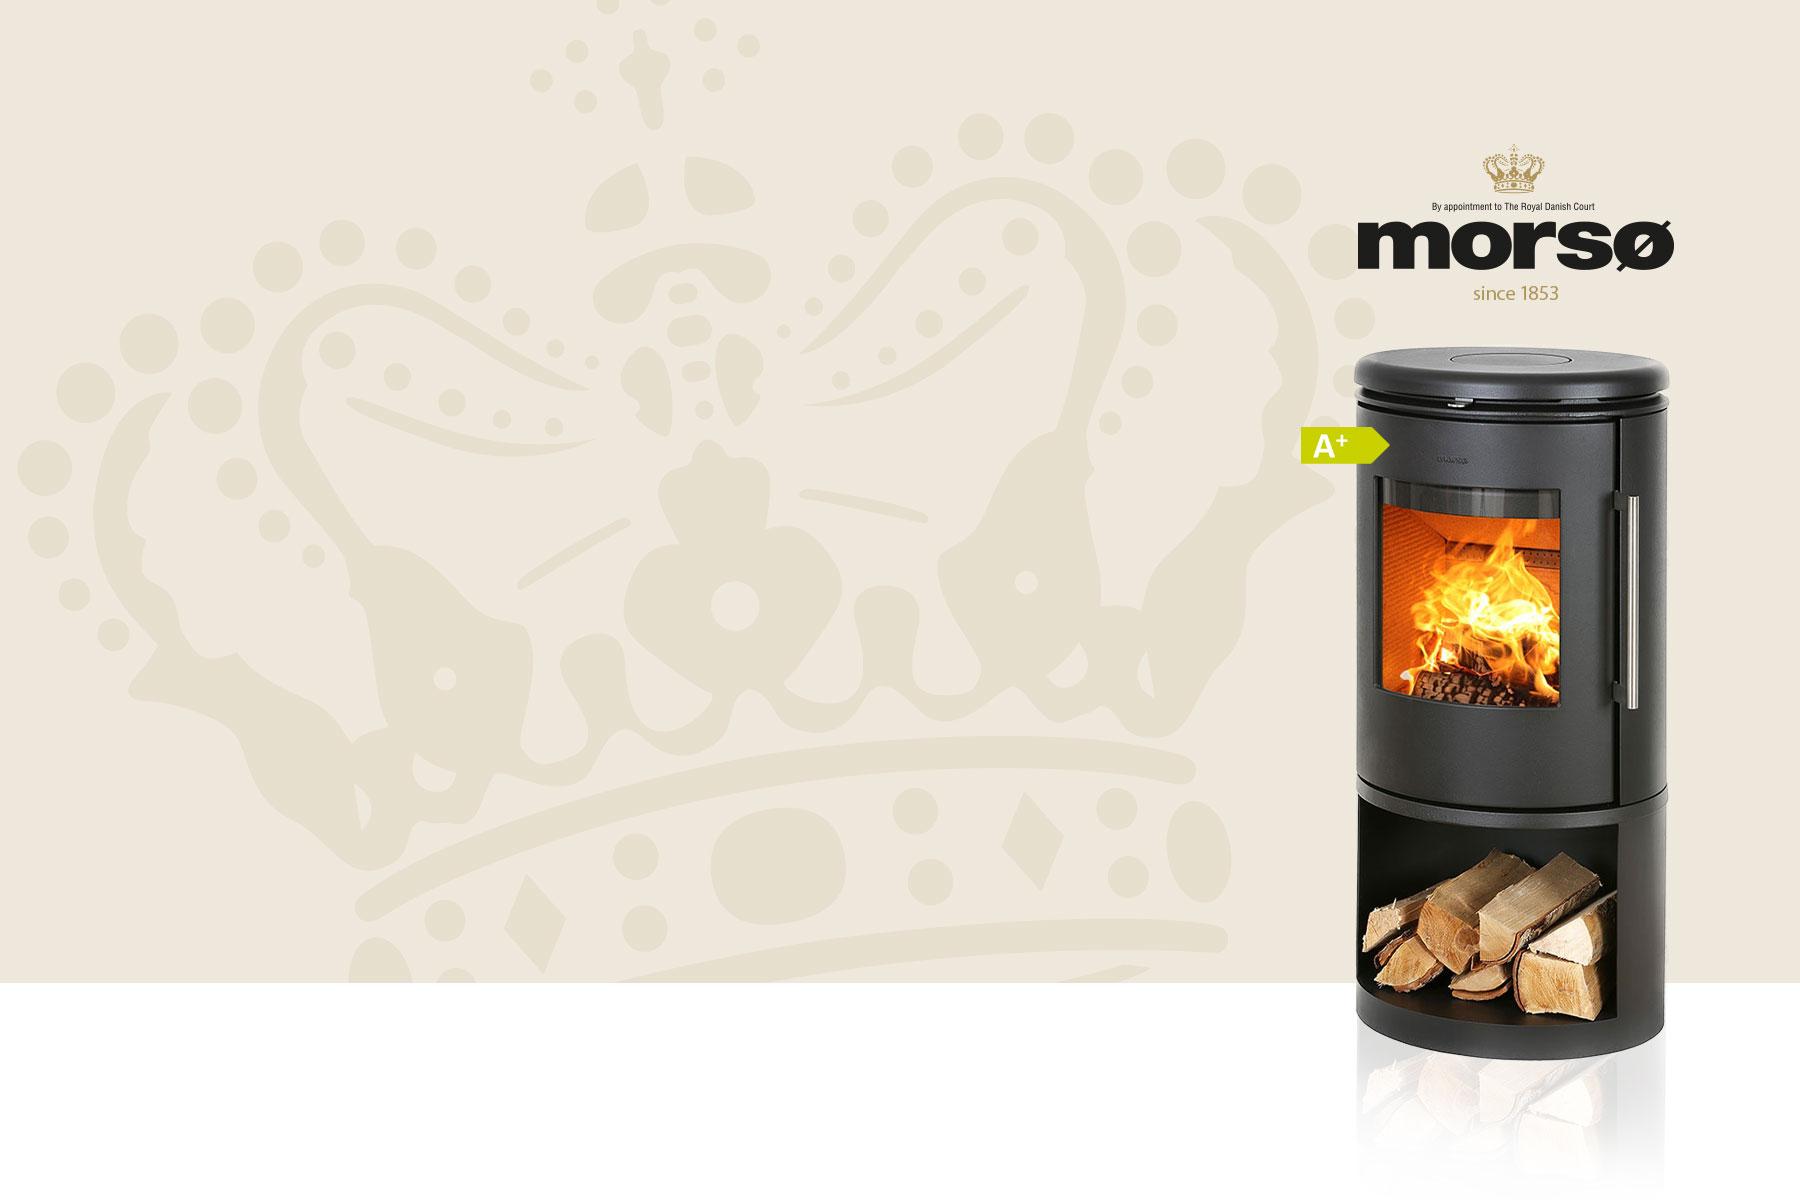 Morsø 6843 zum Angebotspreis